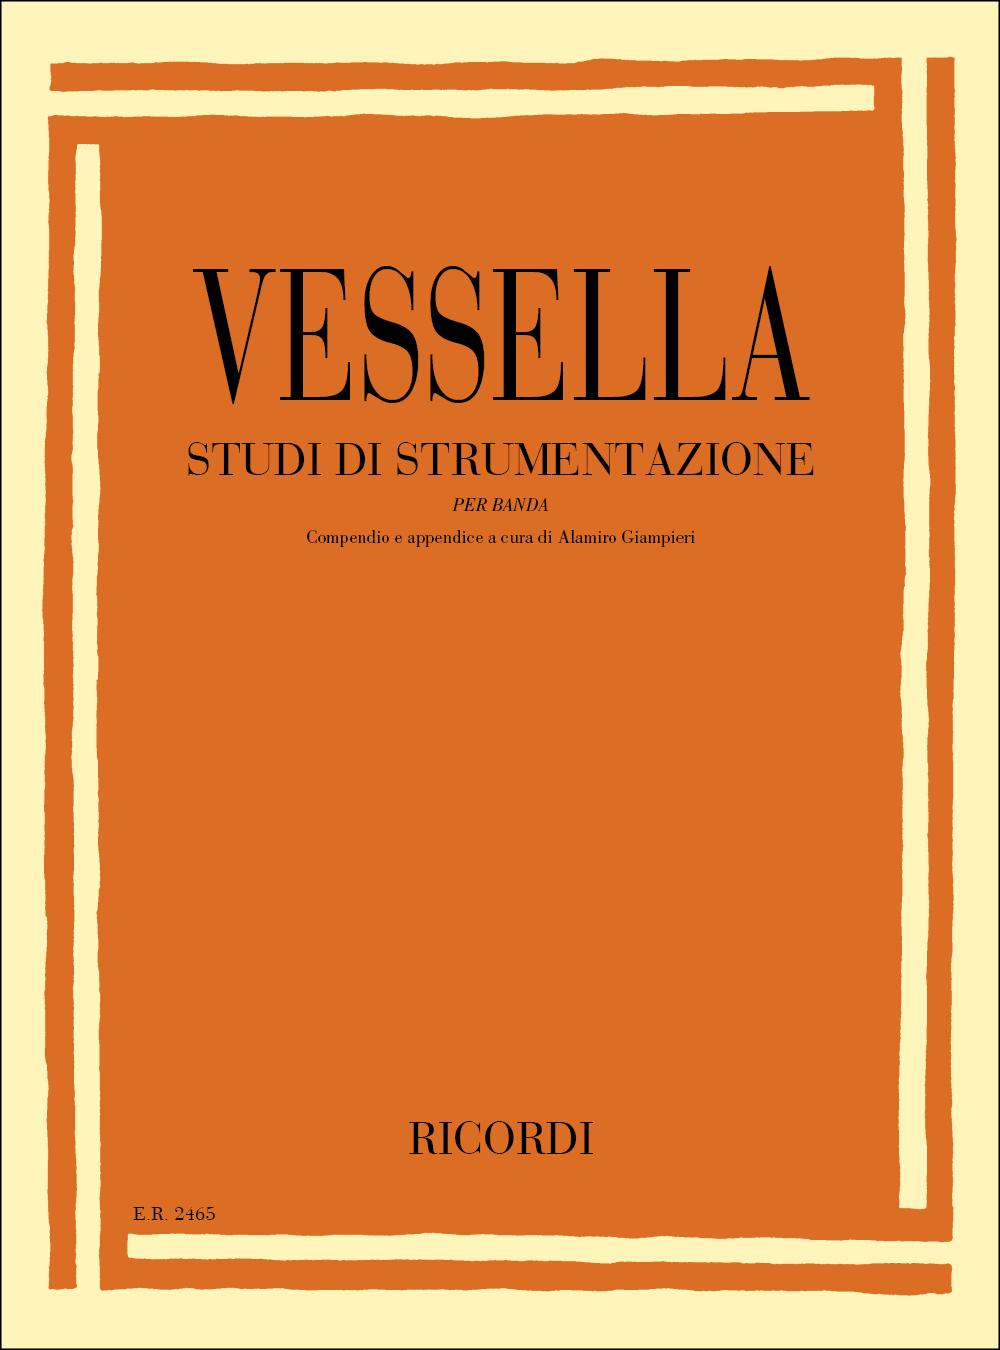 A. Vessella: Studi Di Strumentazione Per Banda